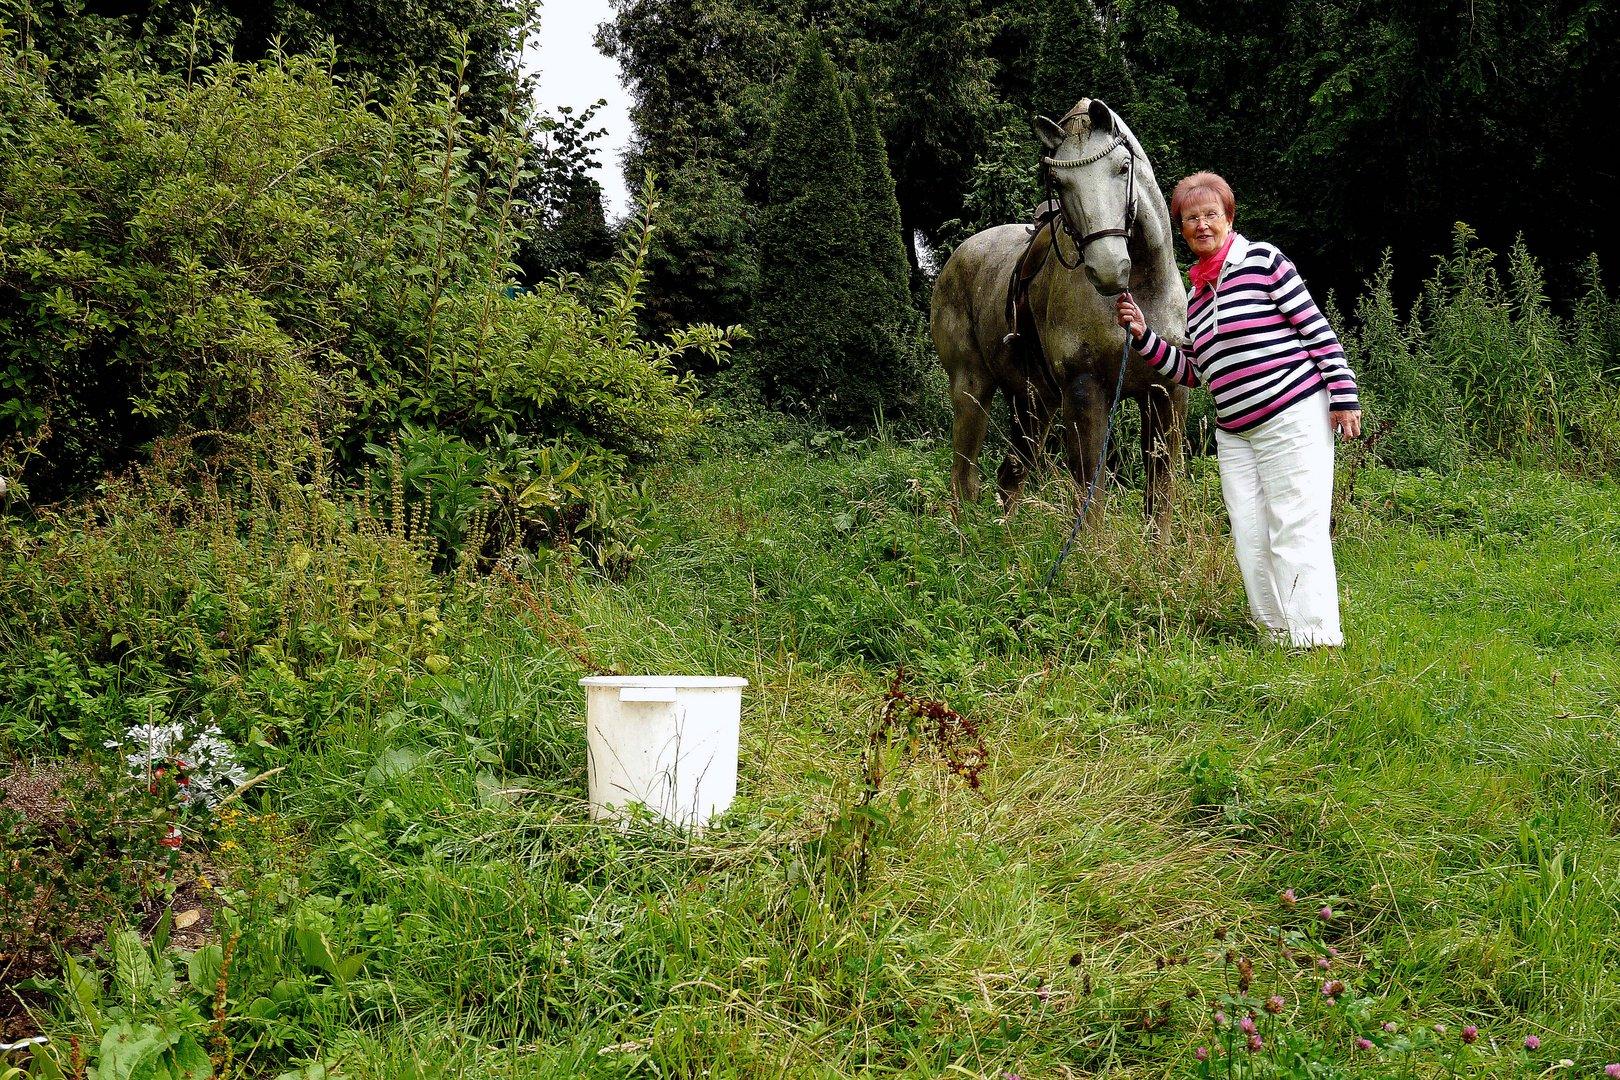 Heidemarie im Pferderausch.